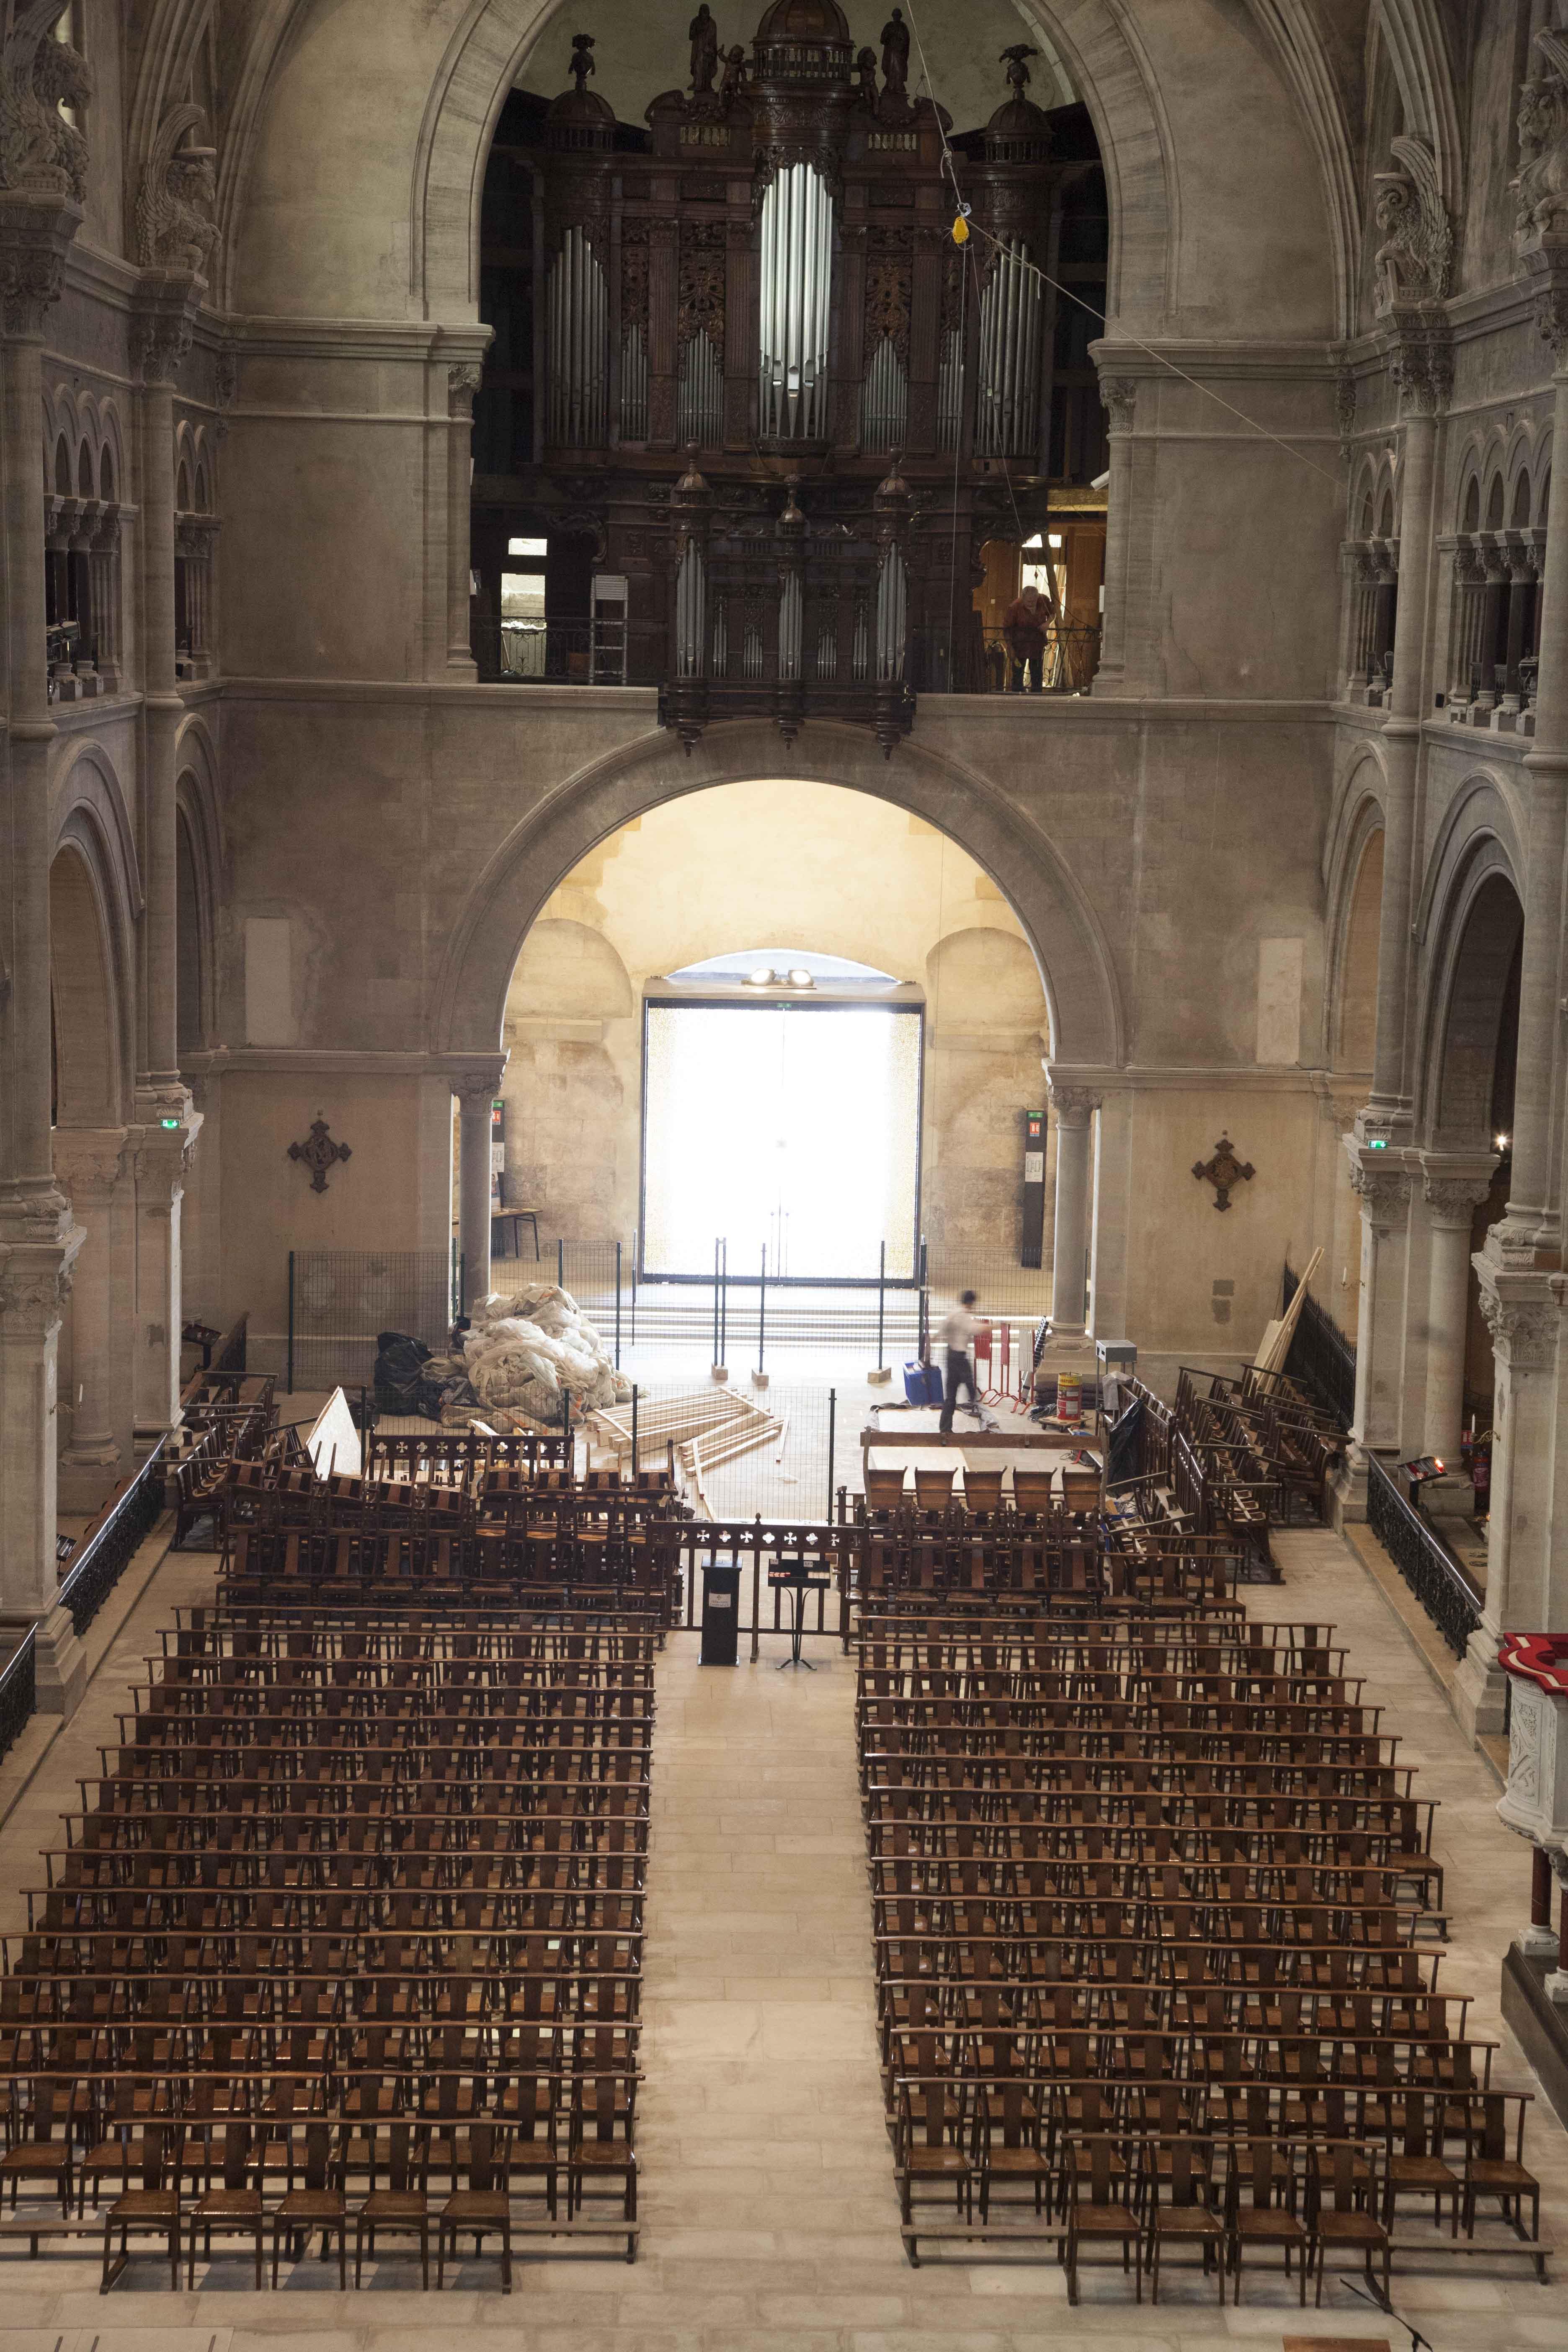 Sele Cathédrale Saint-Castor - Nîmes